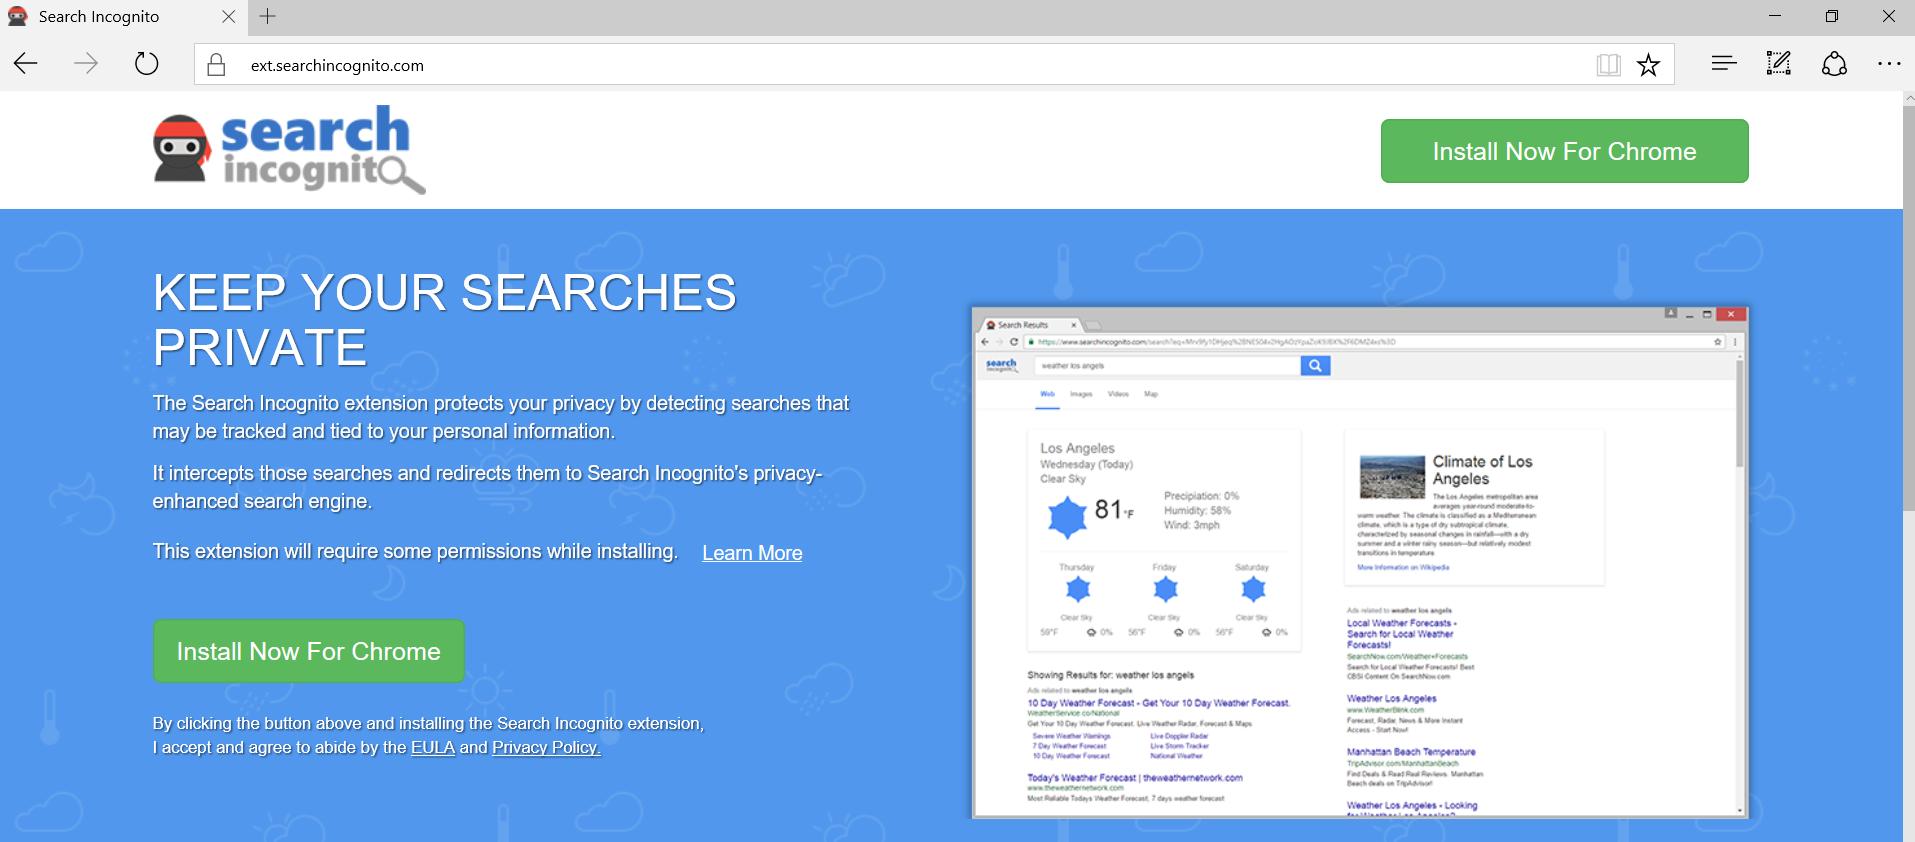 Ads by Search Incognito